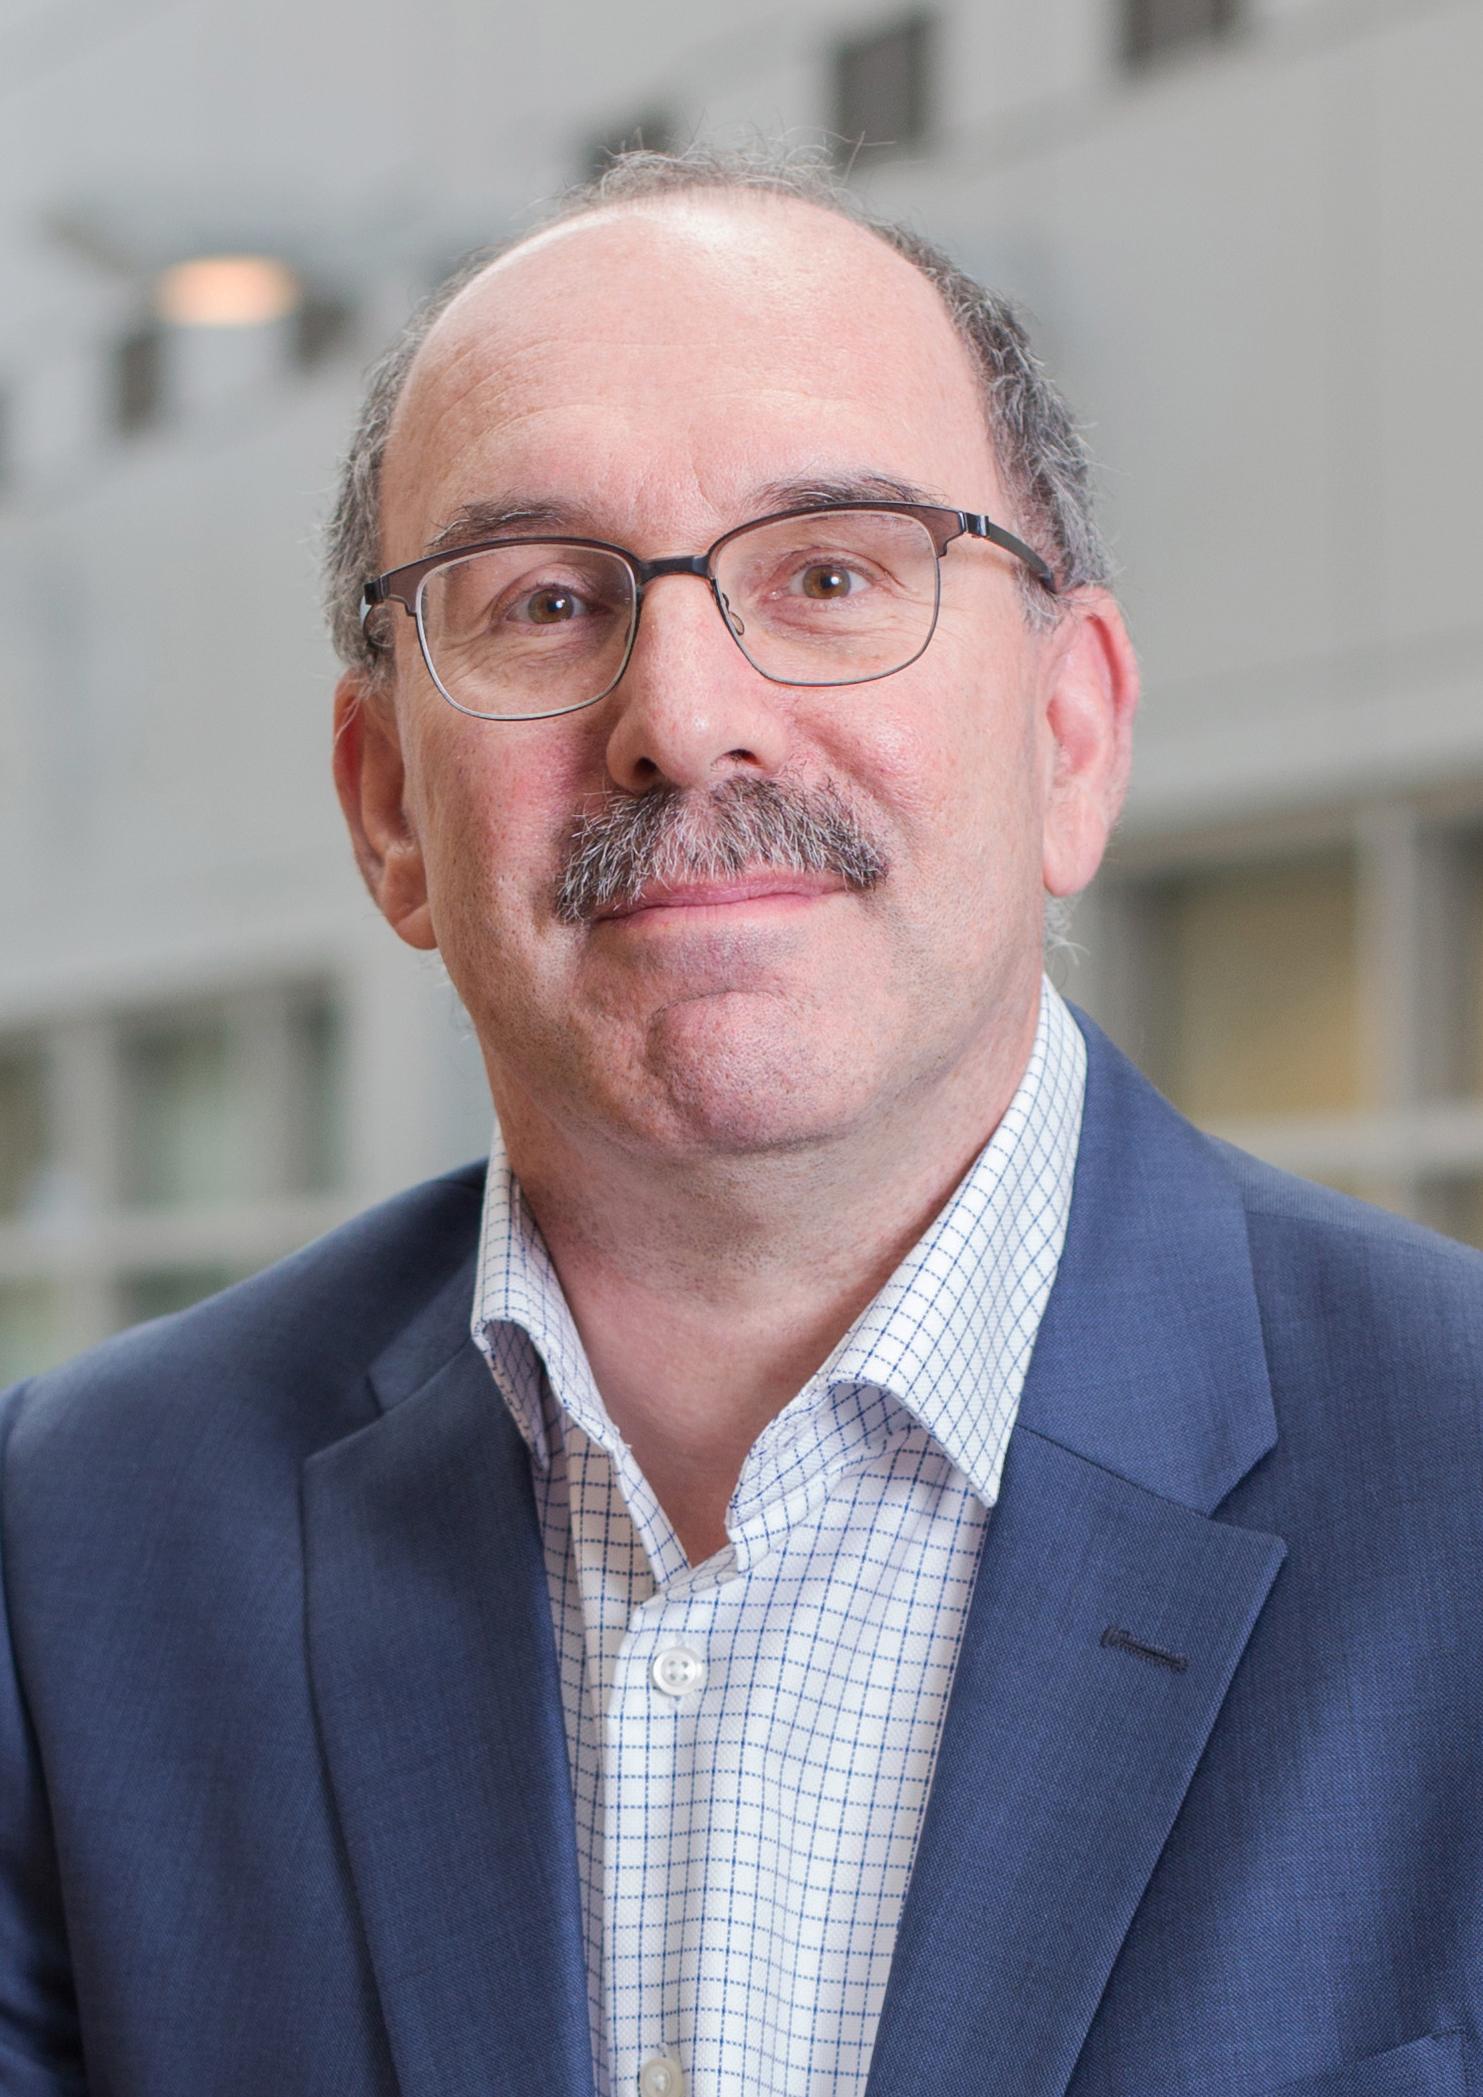 Dr. Keith Sharkey